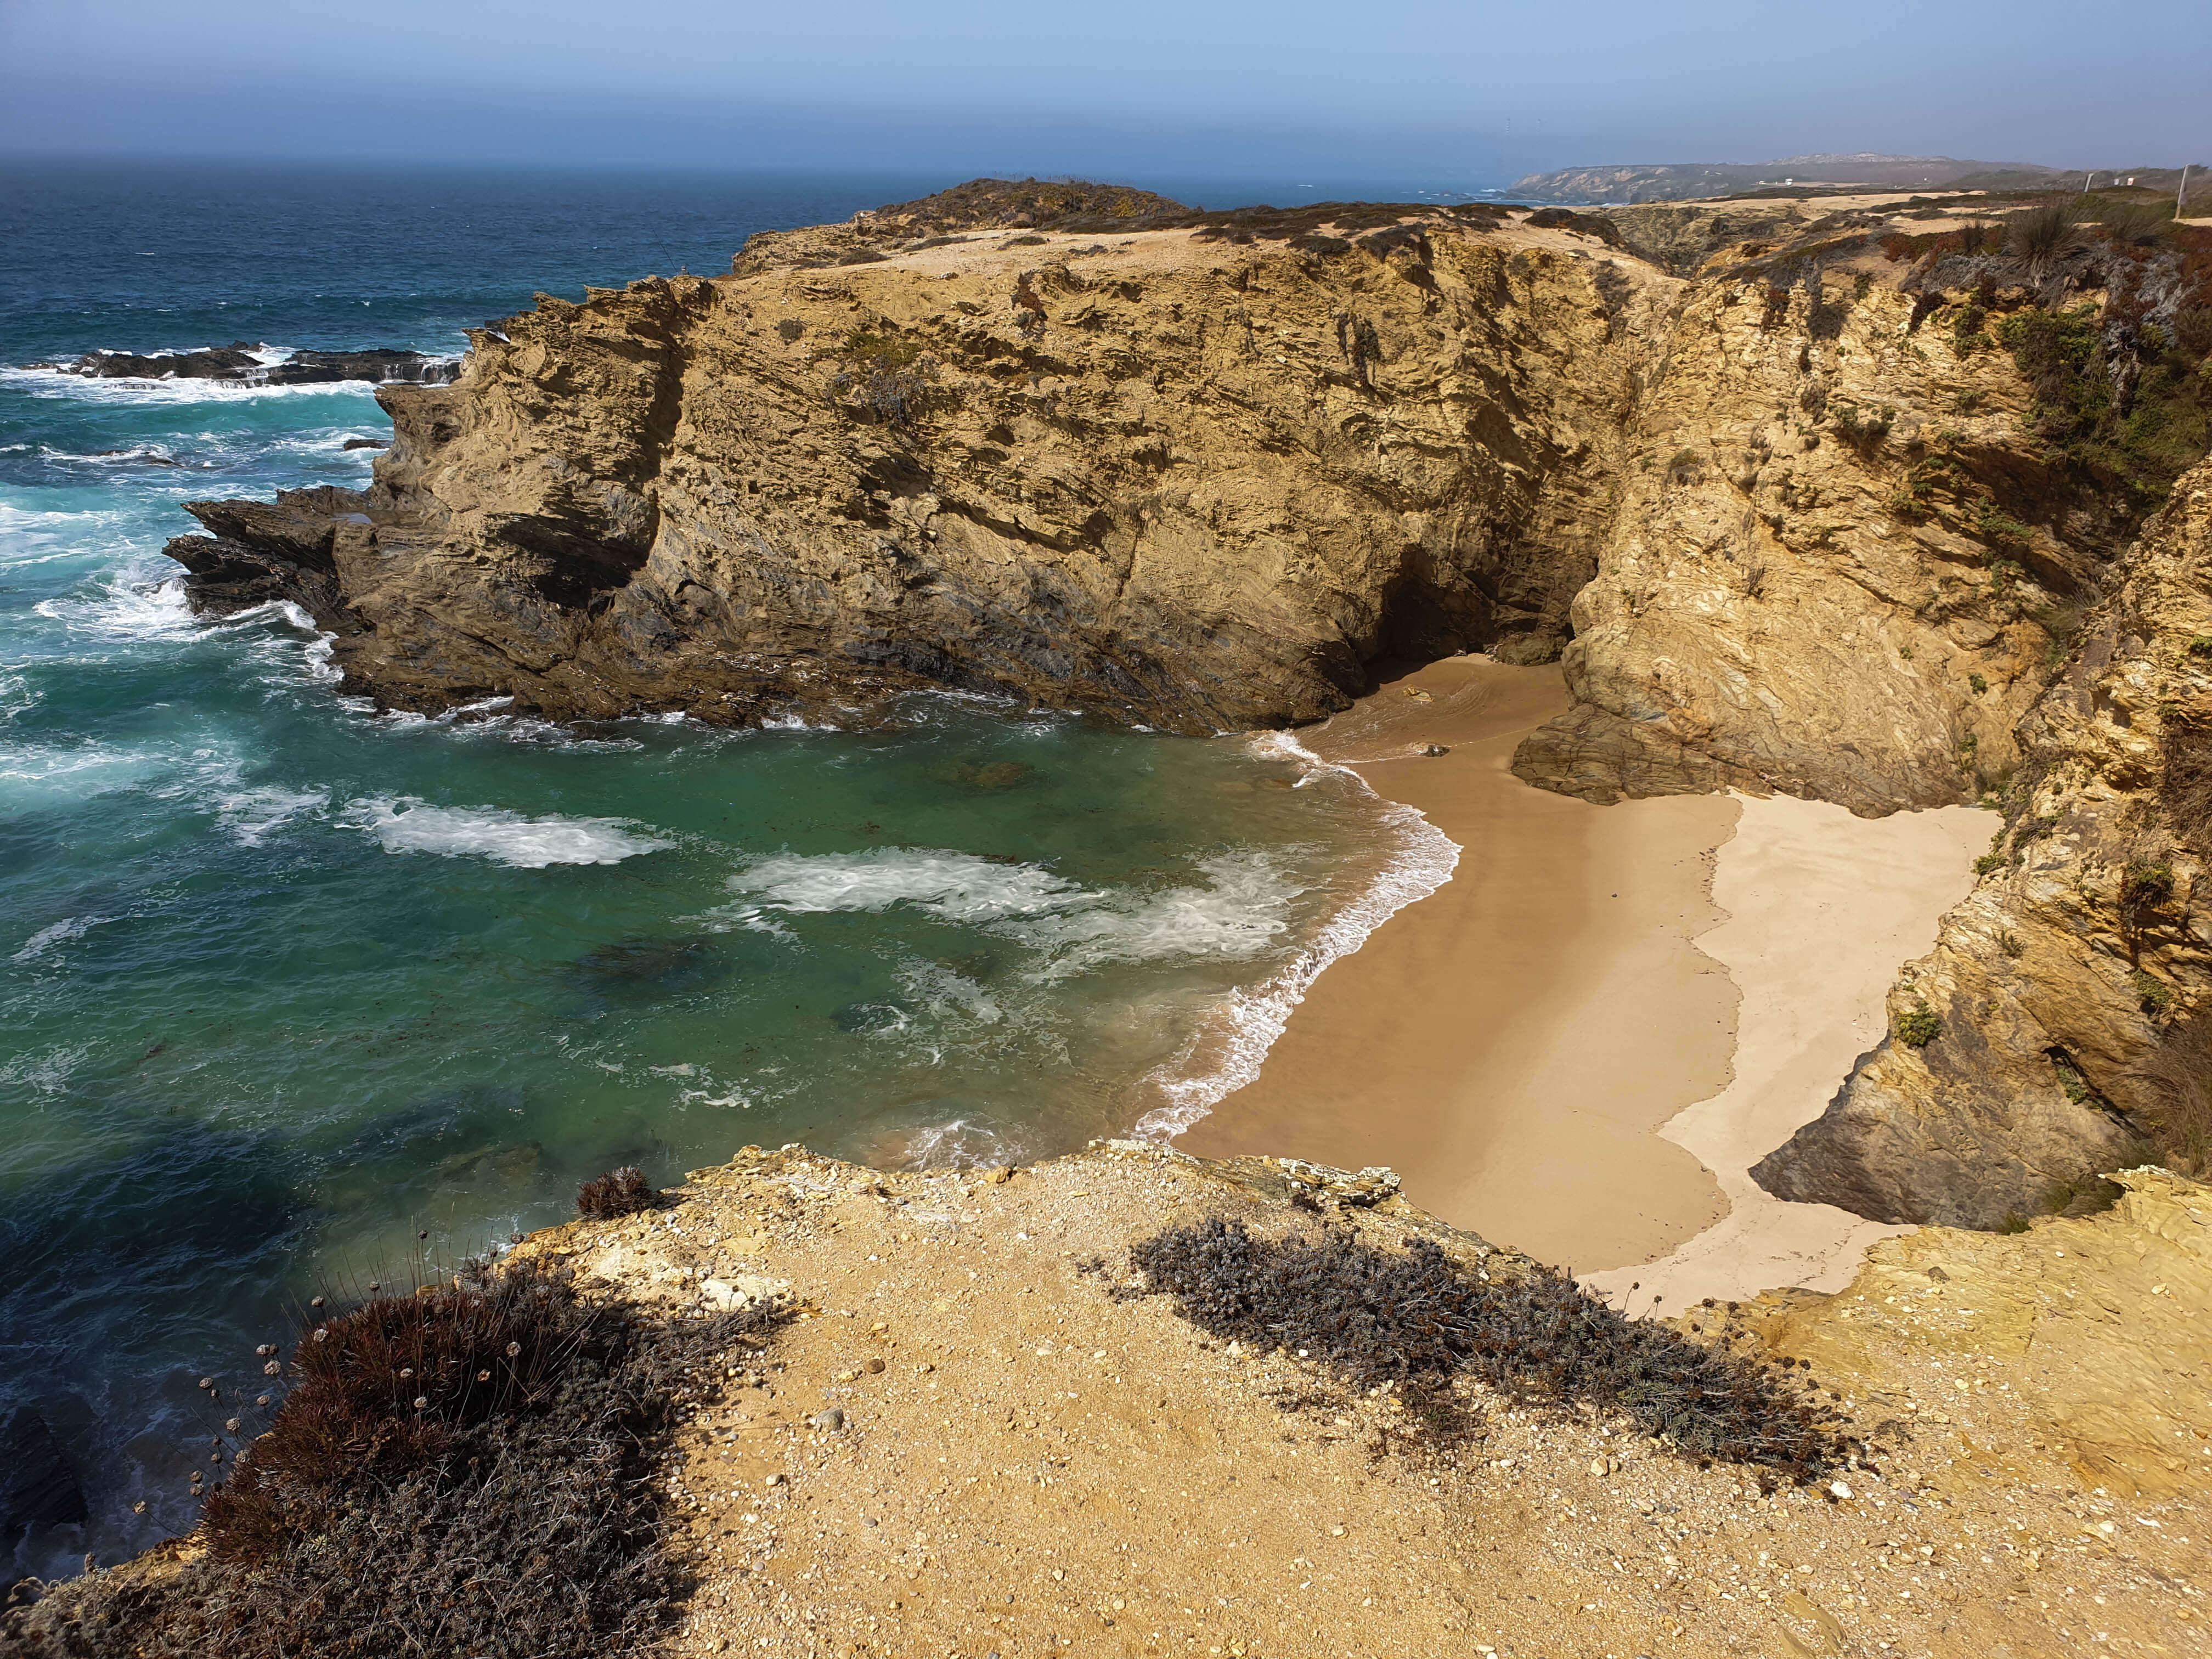 Mooiste stranden Alentejo kust